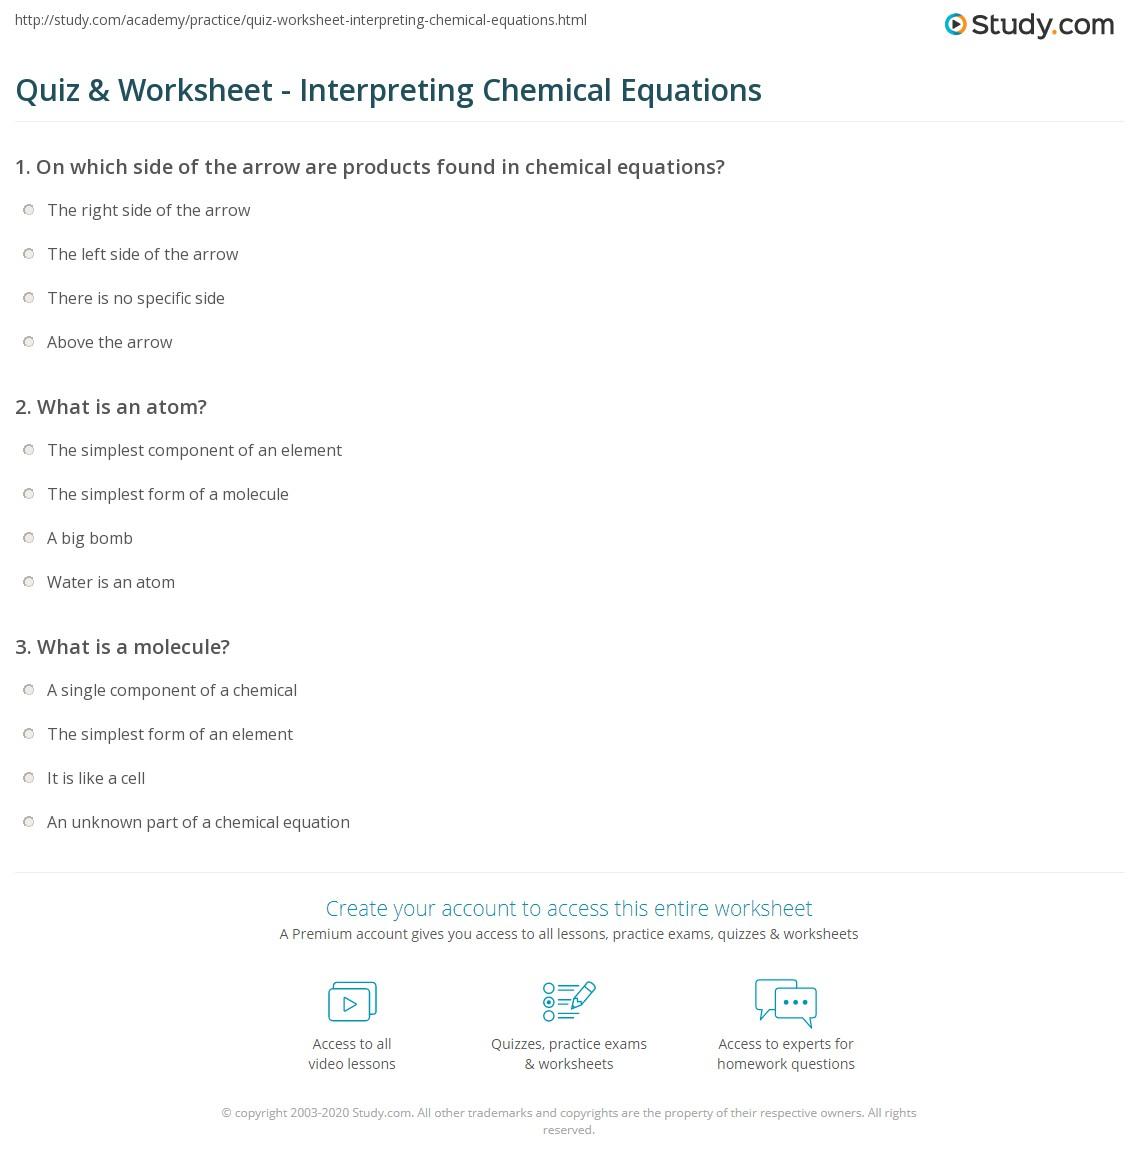 worksheet Chemical Equations And Stoichiometry Worksheet Answers quiz worksheet interpreting chemical equations study com print how to interpret worksheet